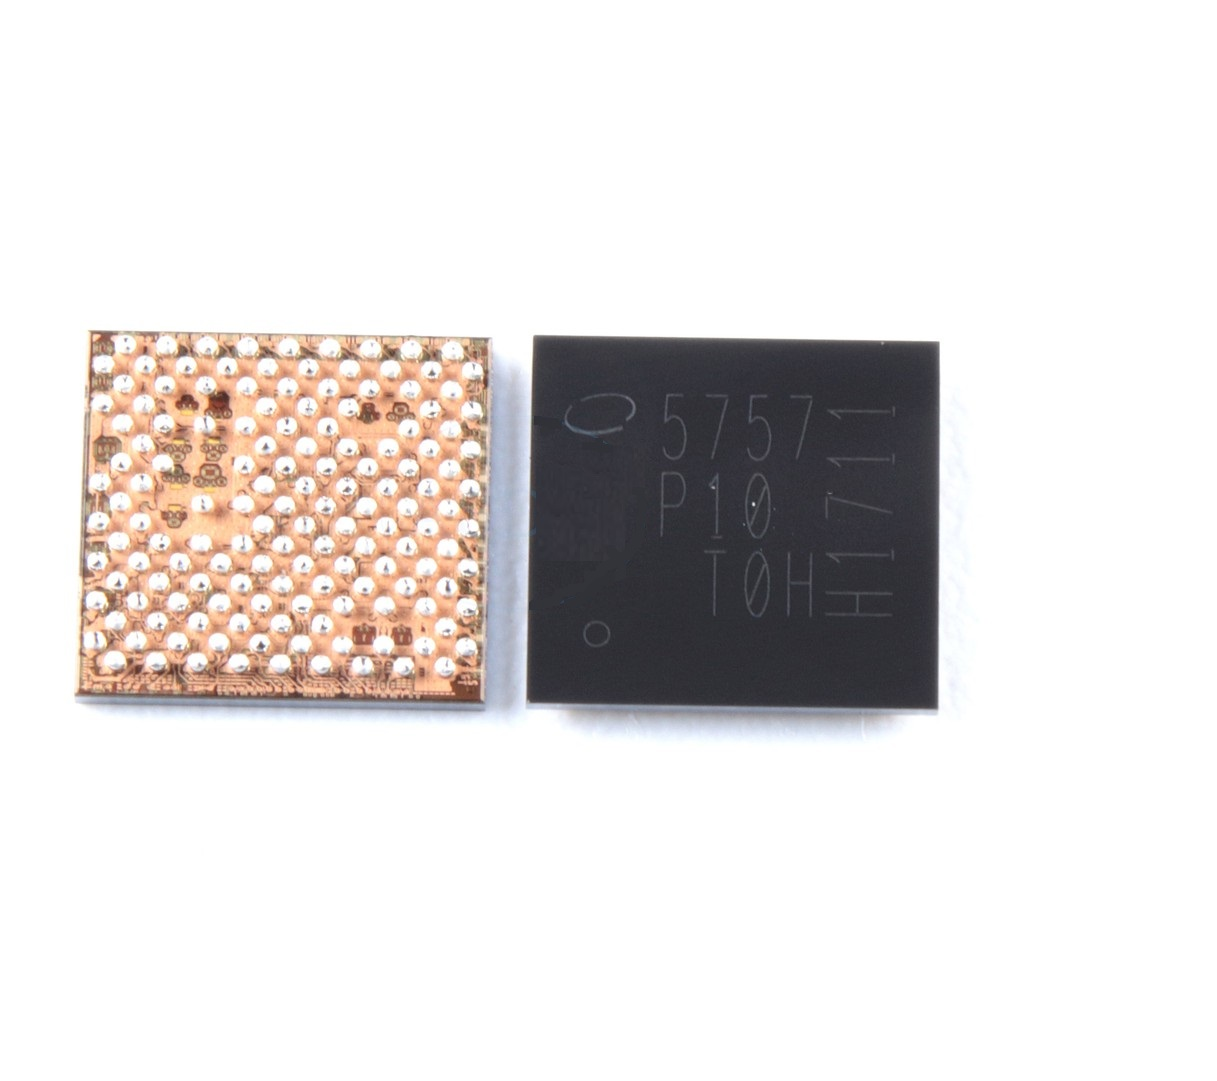 PMB5757 5757 Transceptores de frequência intermediária IF Ic para Iphone 8/ 8 Plus /X